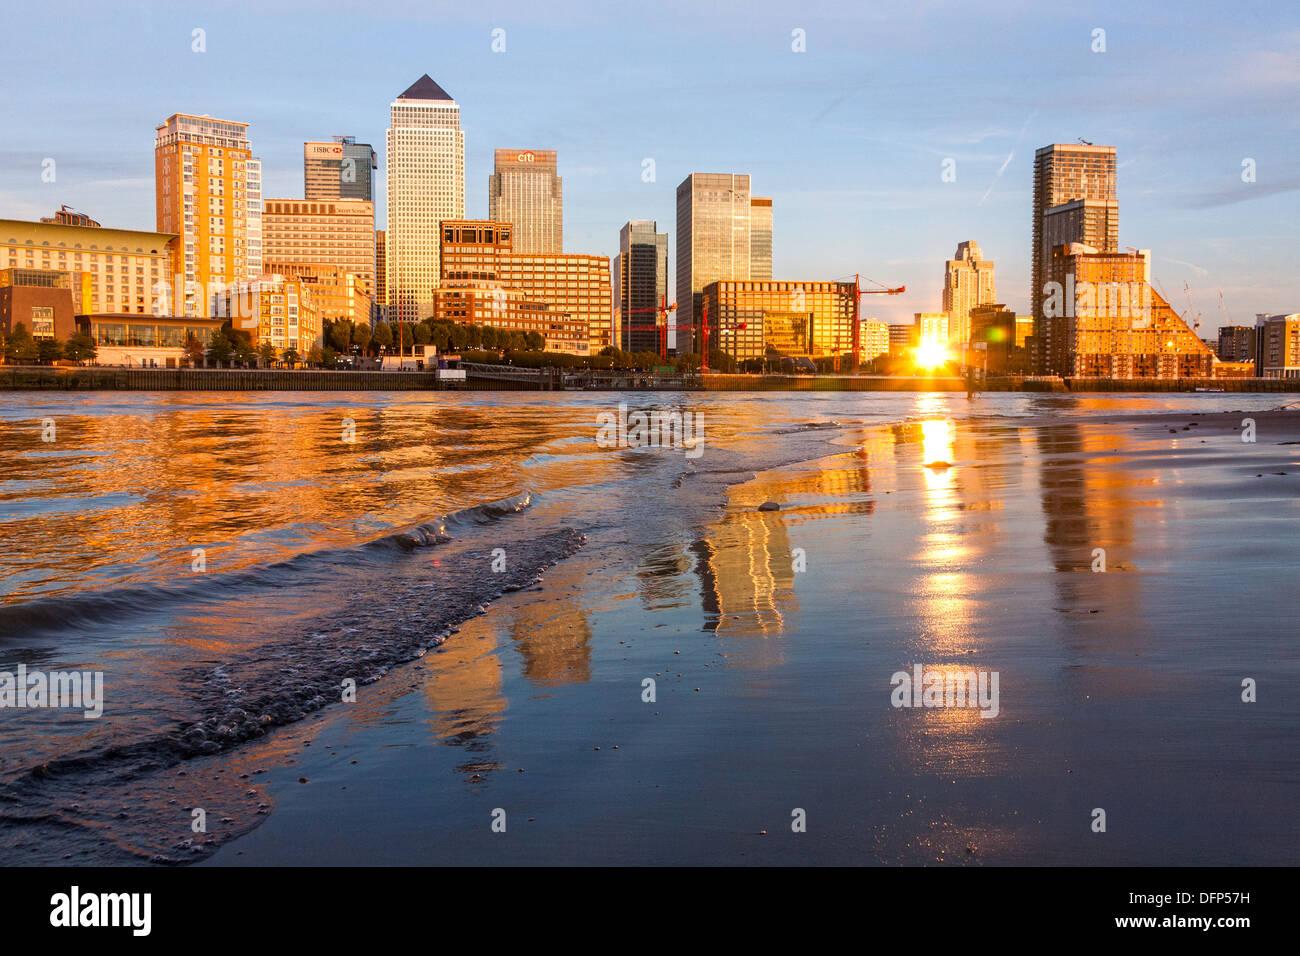 docklands beach golden sunset reflection - Stock Image